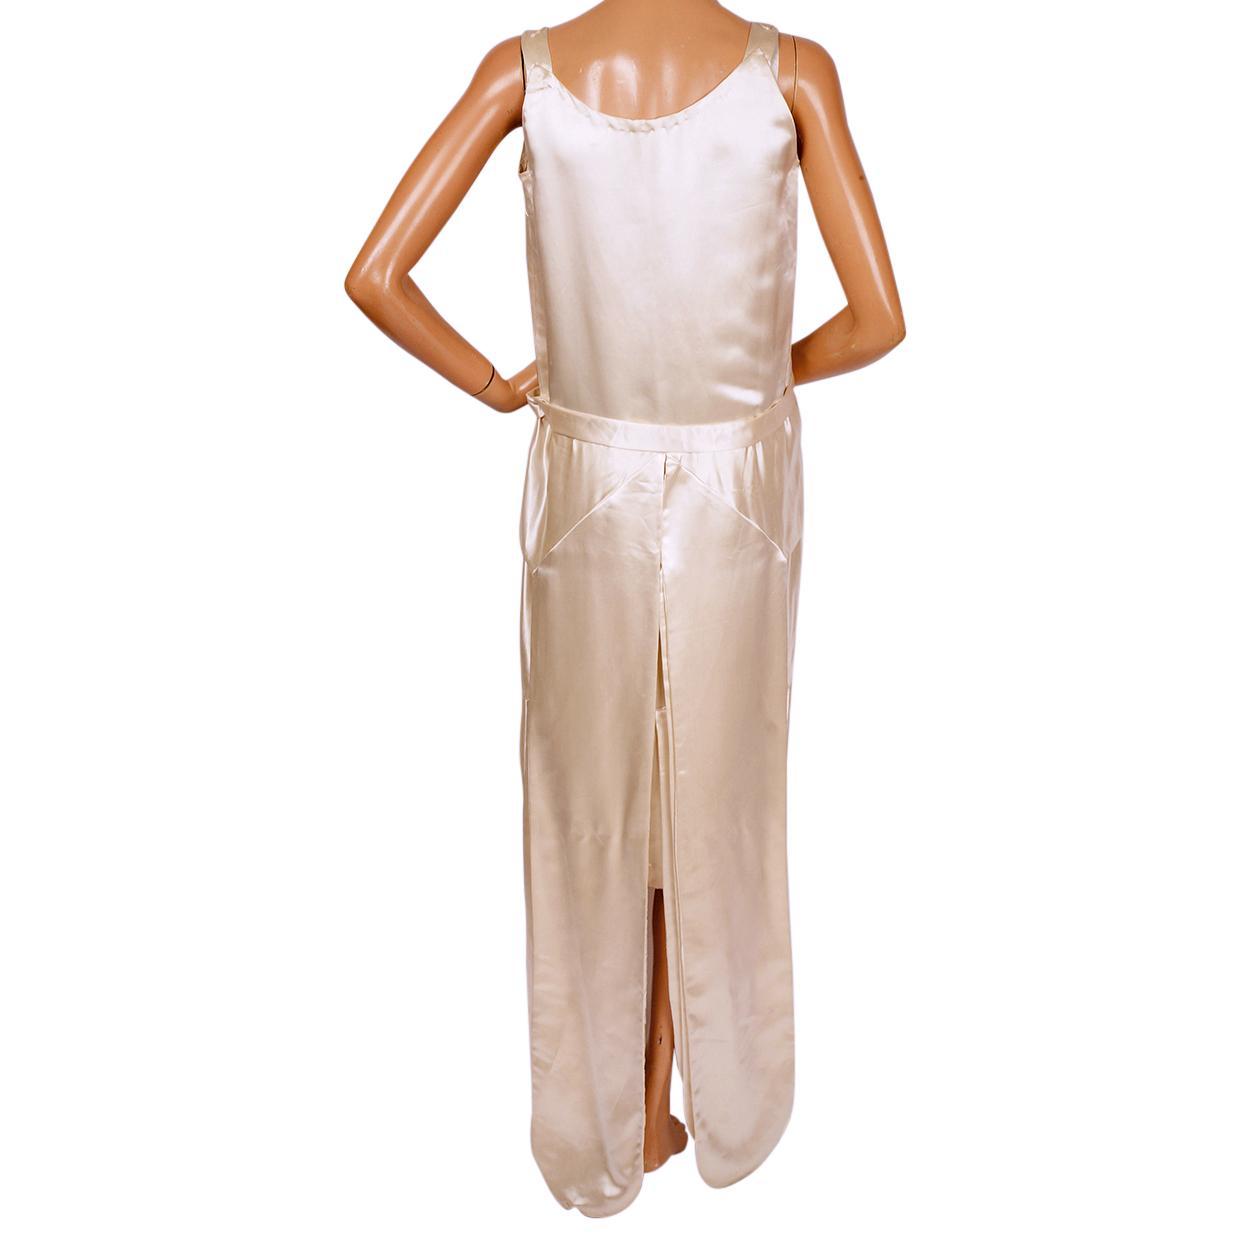 Vintage 1920s Silk Satin Wedding Gown Dress Size Small